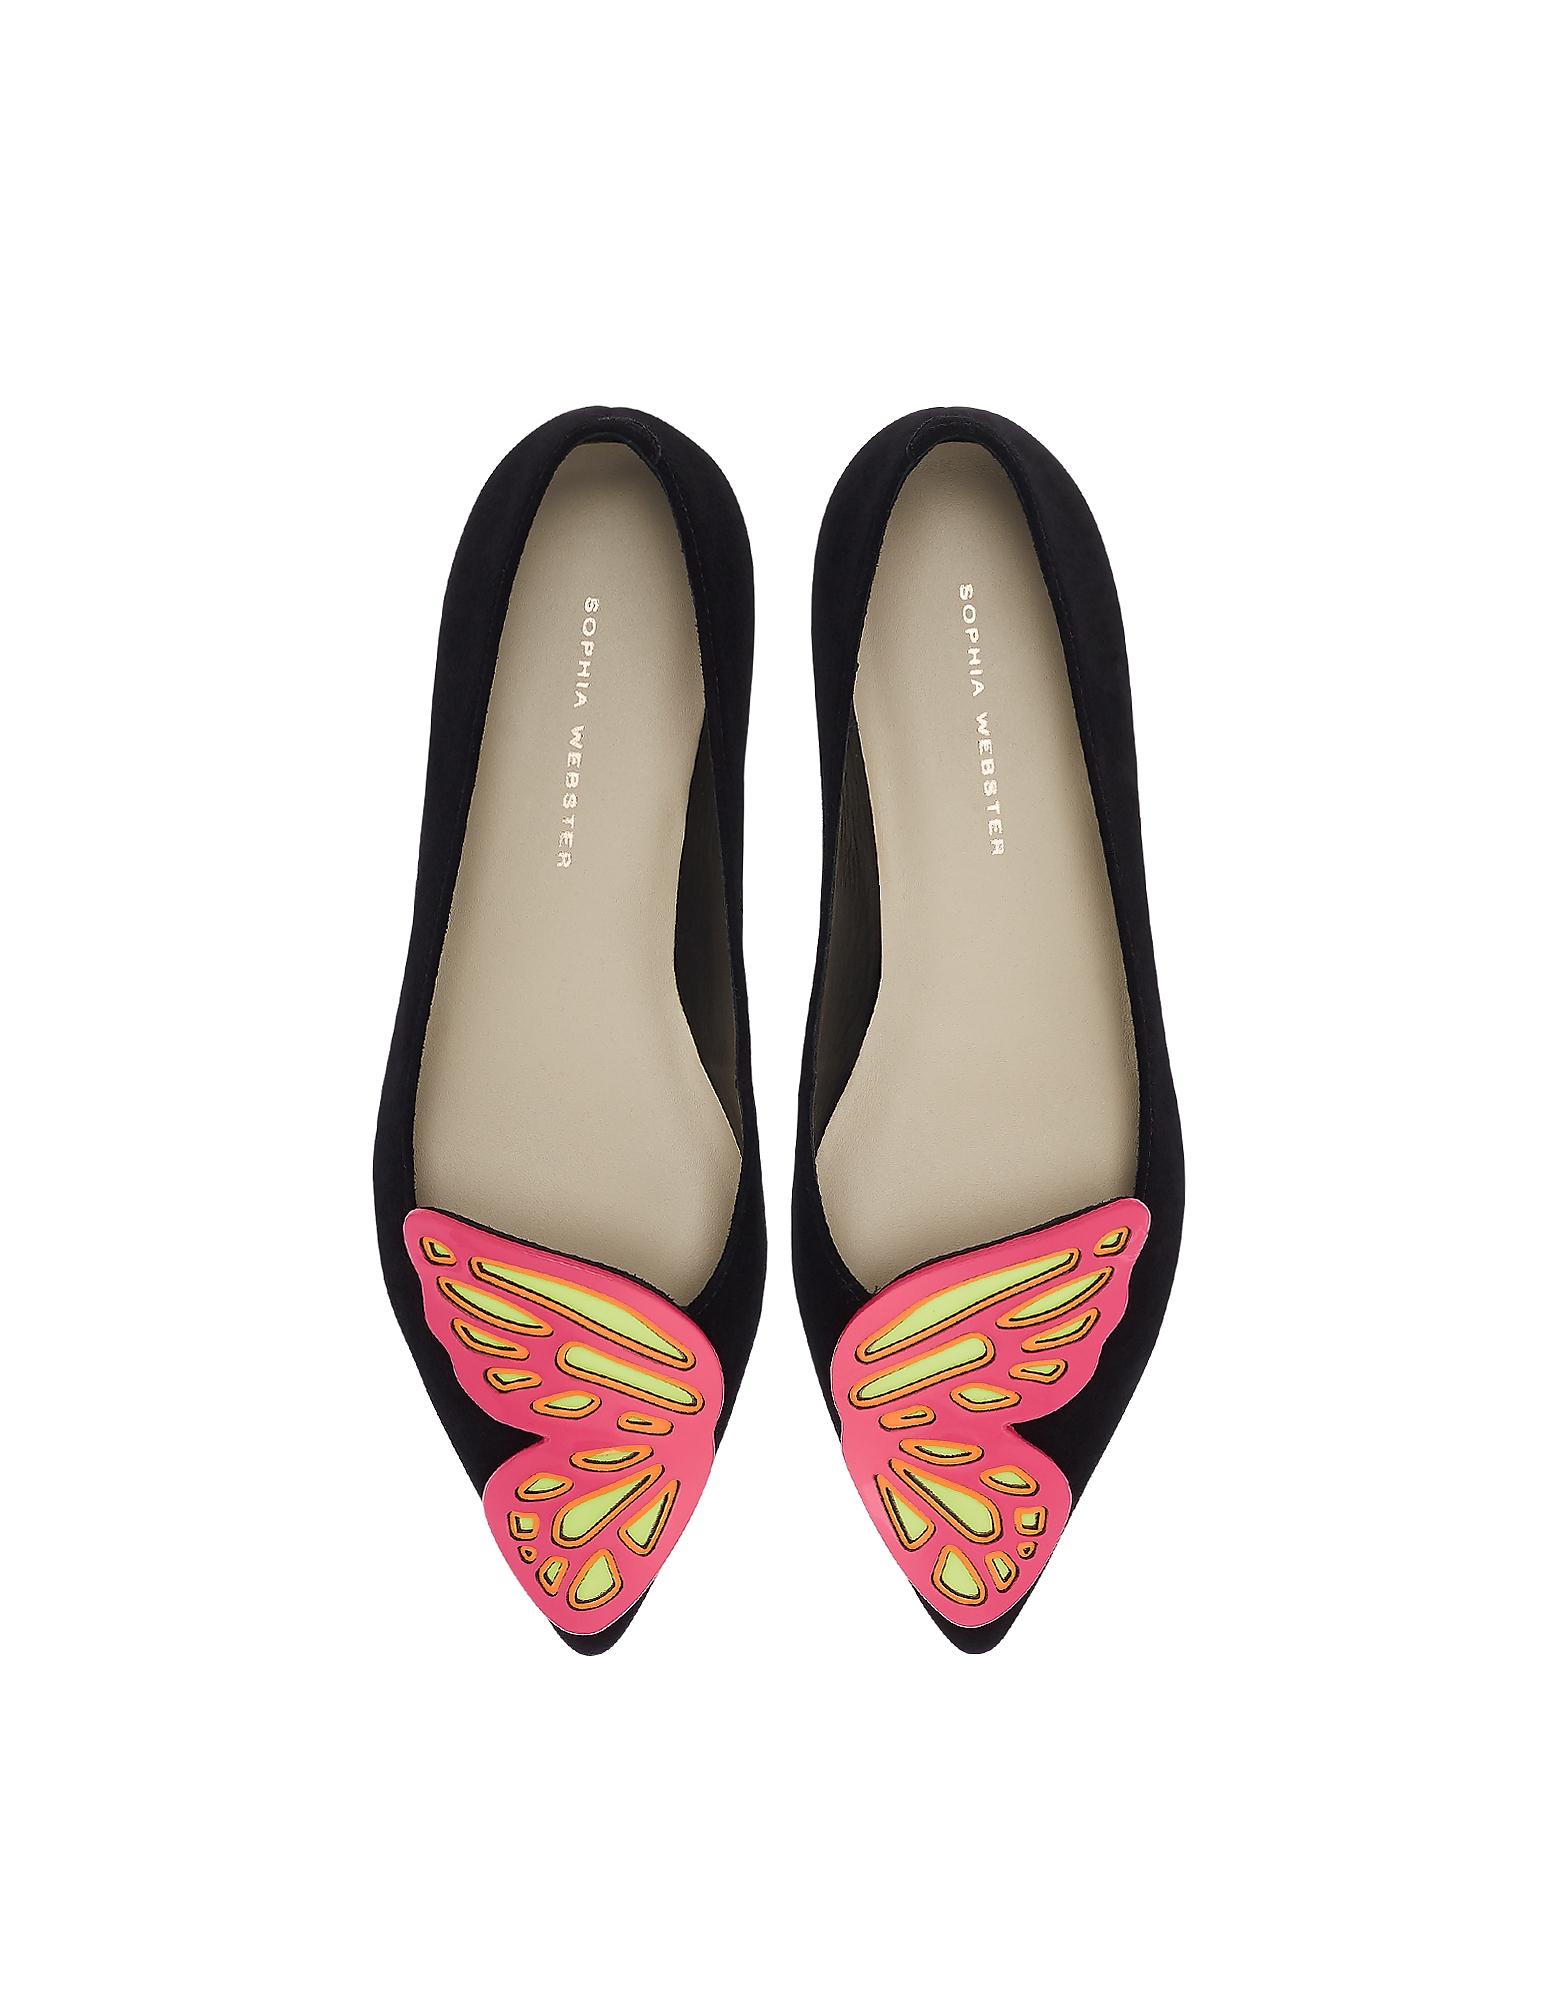 Sophia Webster Designer Shoes, Bibi Butterfly Flat Ballerinas